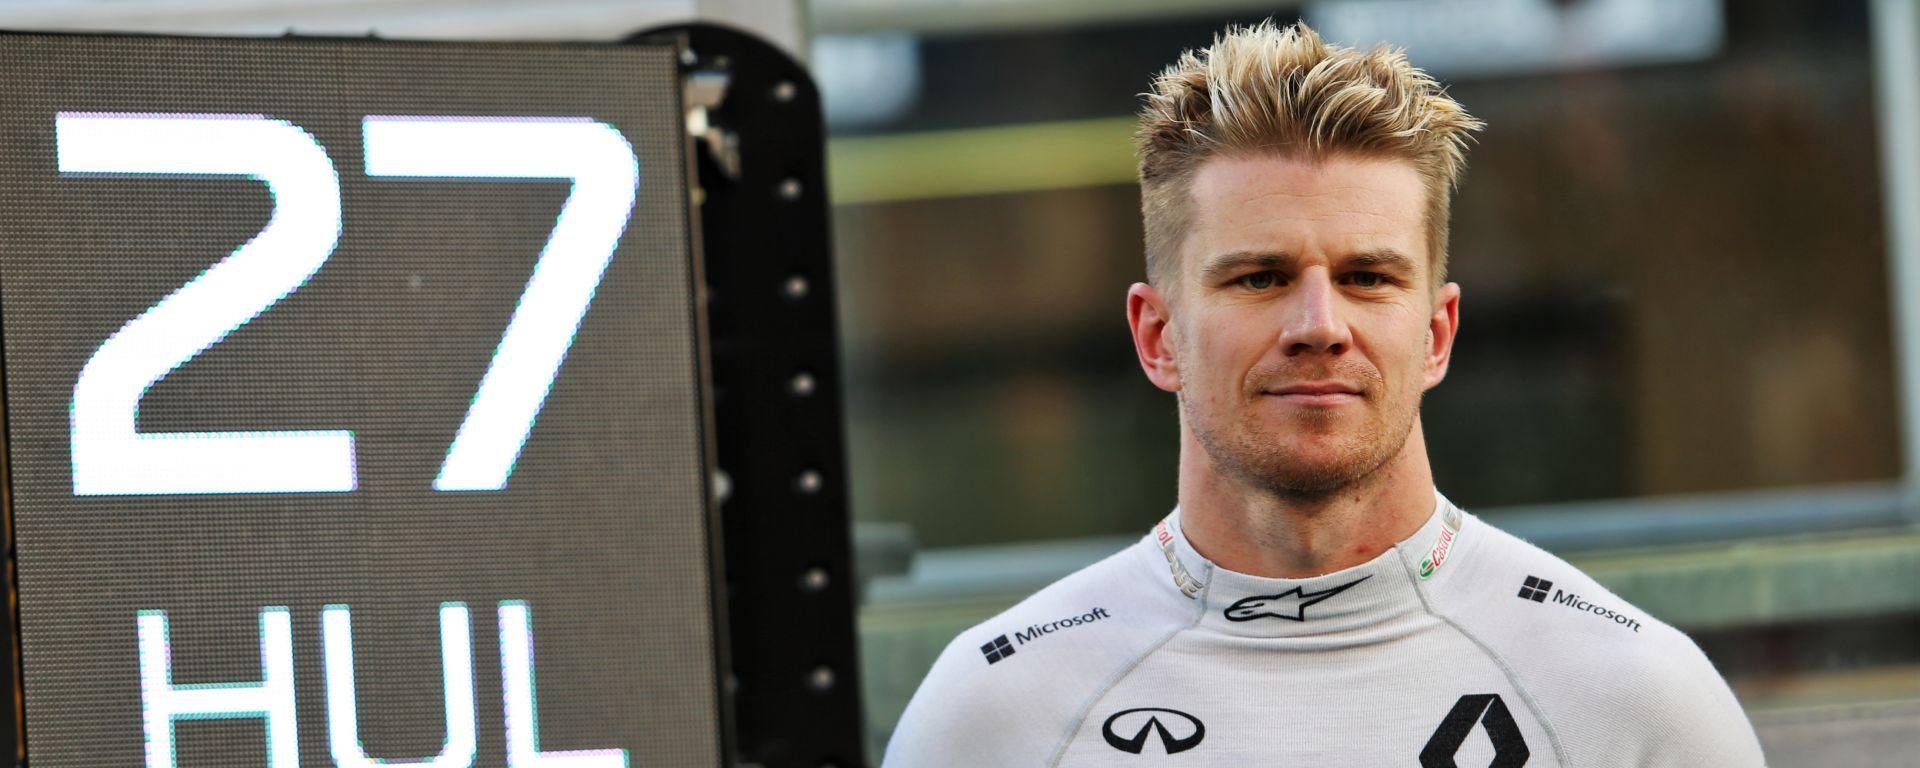 F1: Nico Hulkenberg (Renault)